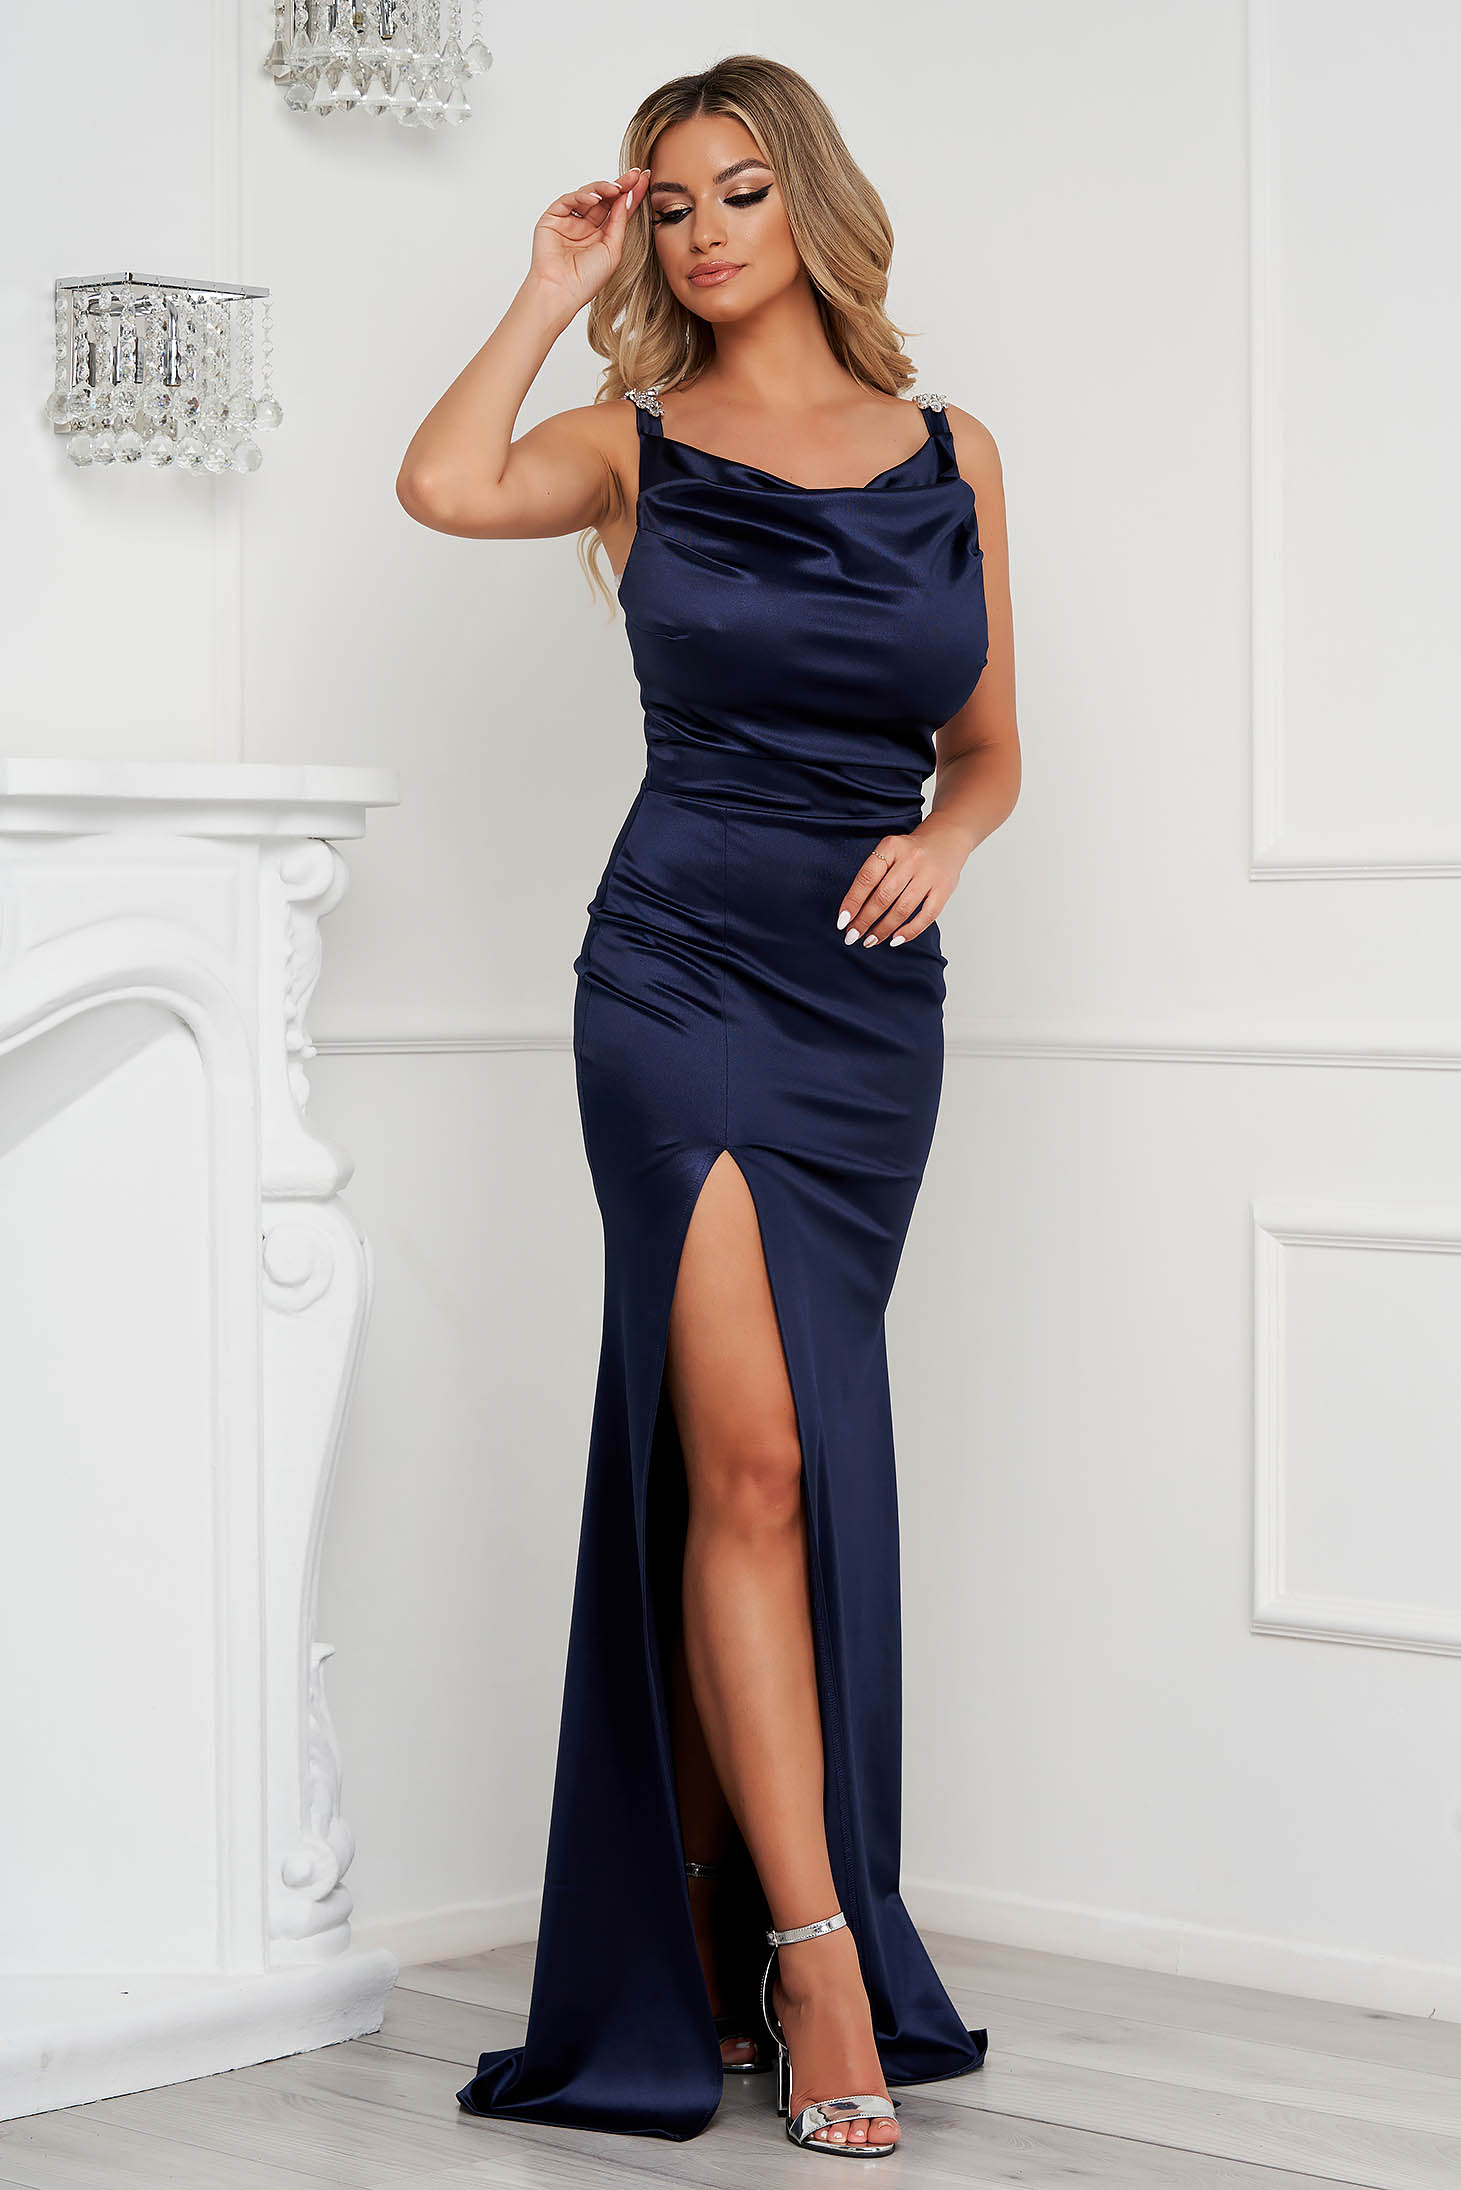 Rochie StarShinerS albastru-inchis lunga de ocazie din material elastic si lucios accesorizata cu pietre stras la bretele